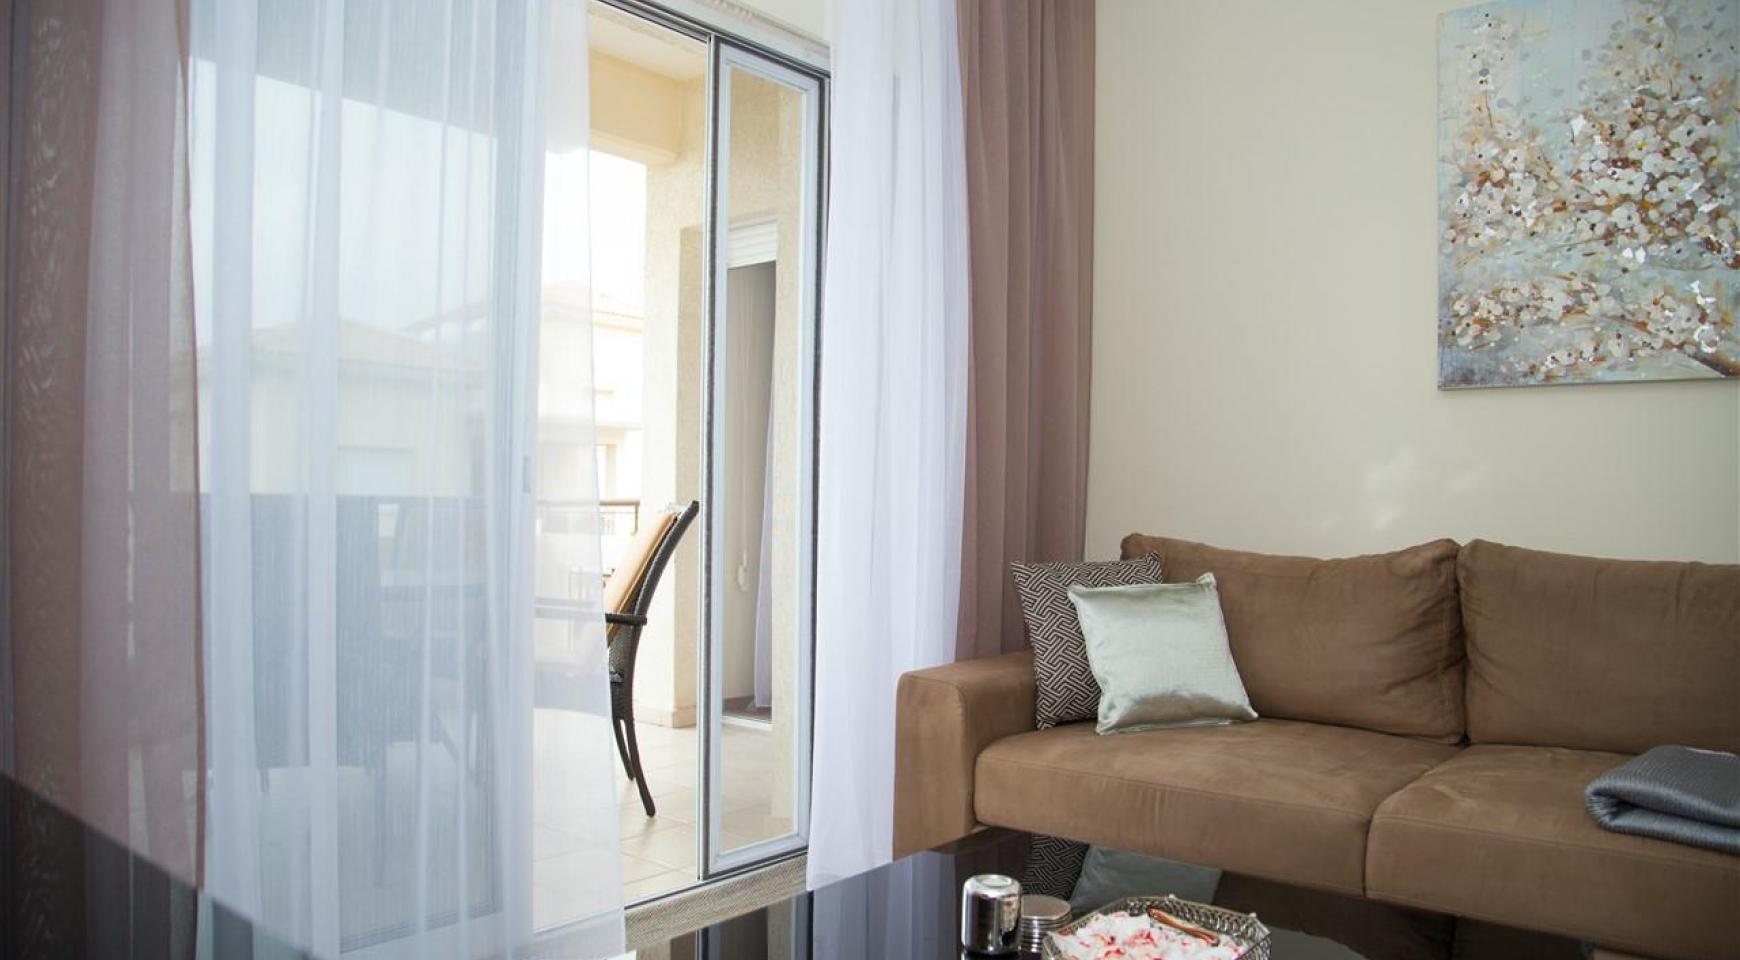 2 Bedroom Apartment Mesogios Iris 304 in the Complex near the Sea - 6